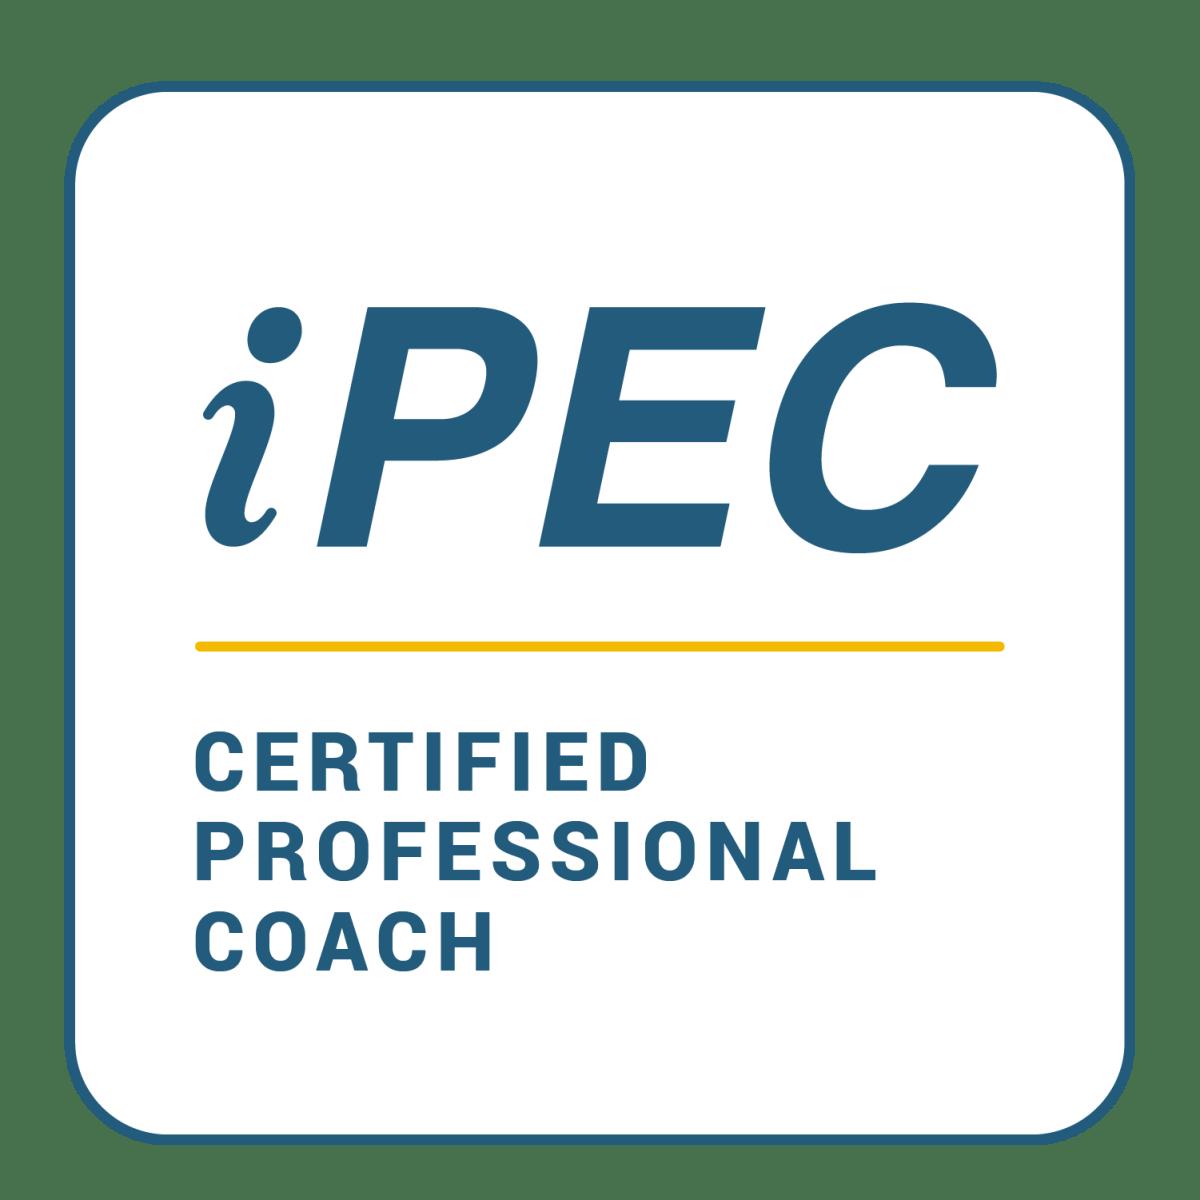 Mike Bird, Certified Professional Coach (CPC)